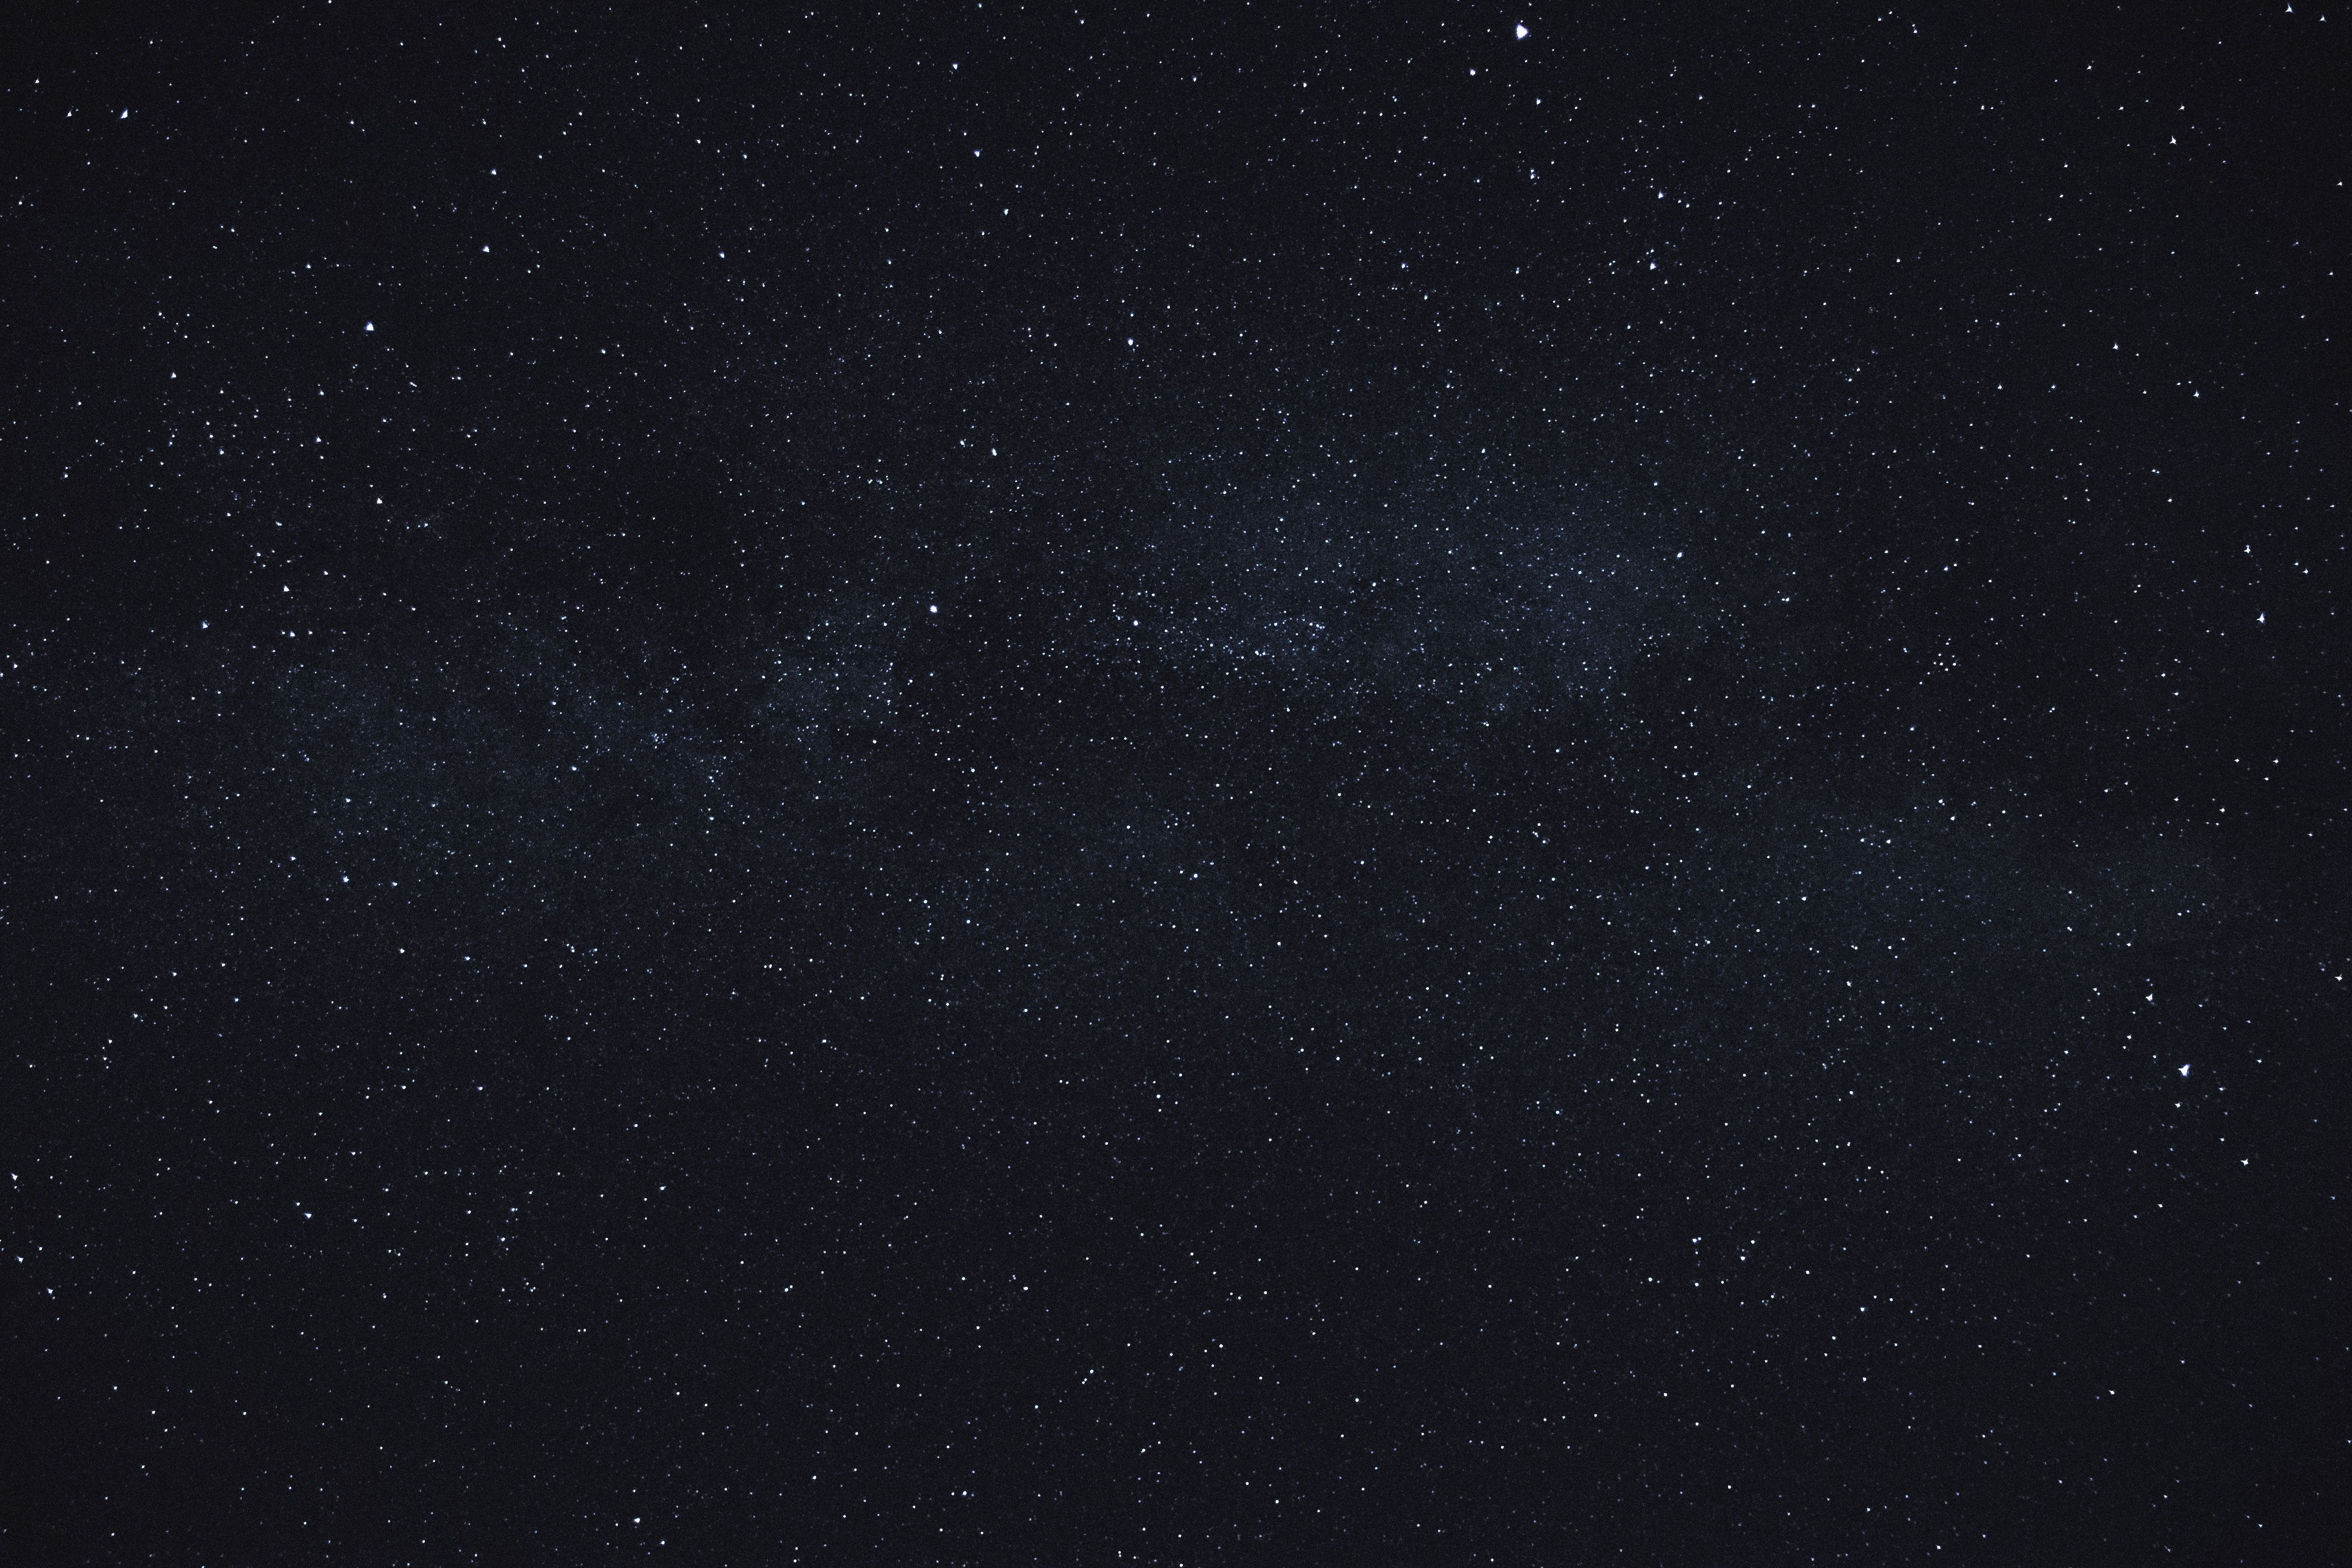 Dark Galaxy Wallpapers Top Free Dark Galaxy Backgrounds